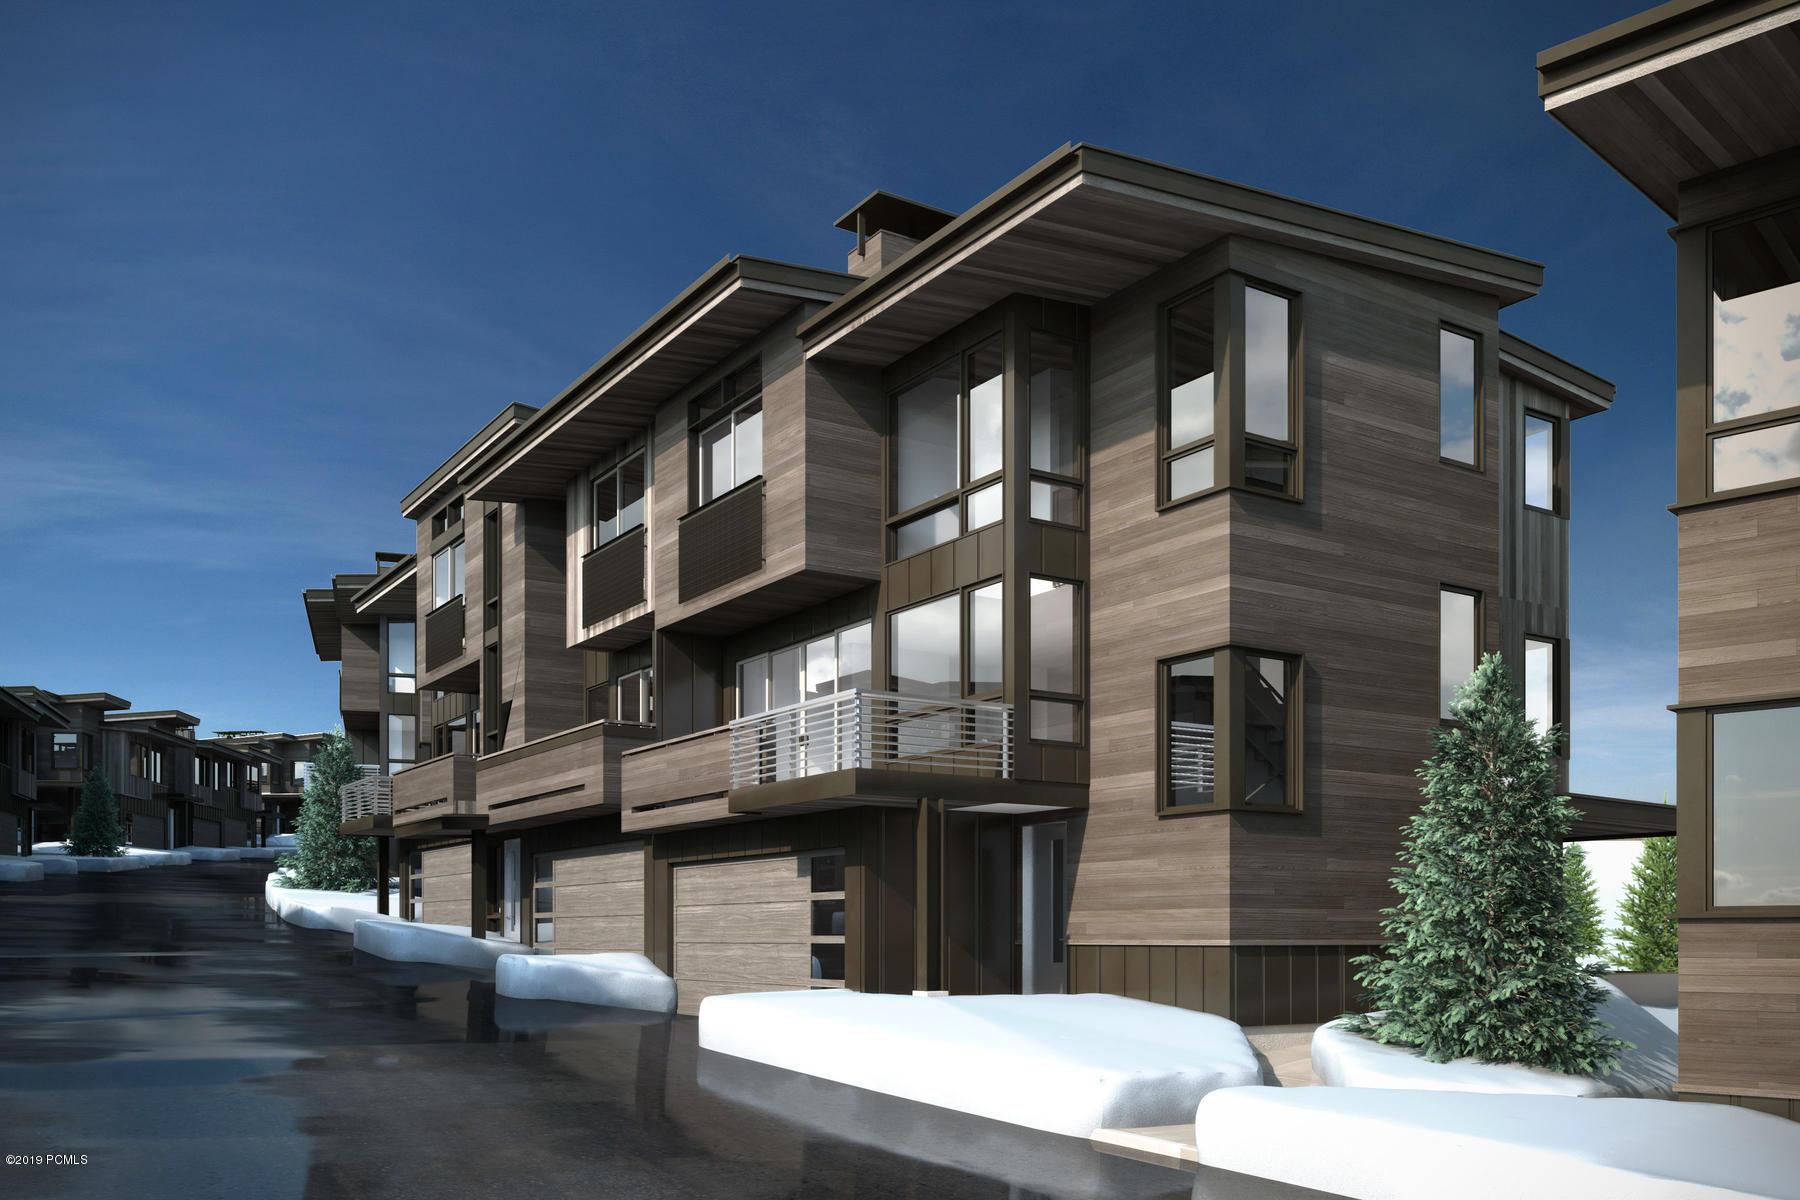 3575 Ridgeline Drive, Park City, Utah 84098, 5 Bedrooms Bedrooms, ,5 BathroomsBathrooms,Condominium,For Sale,Ridgeline,20190109112430415765000000